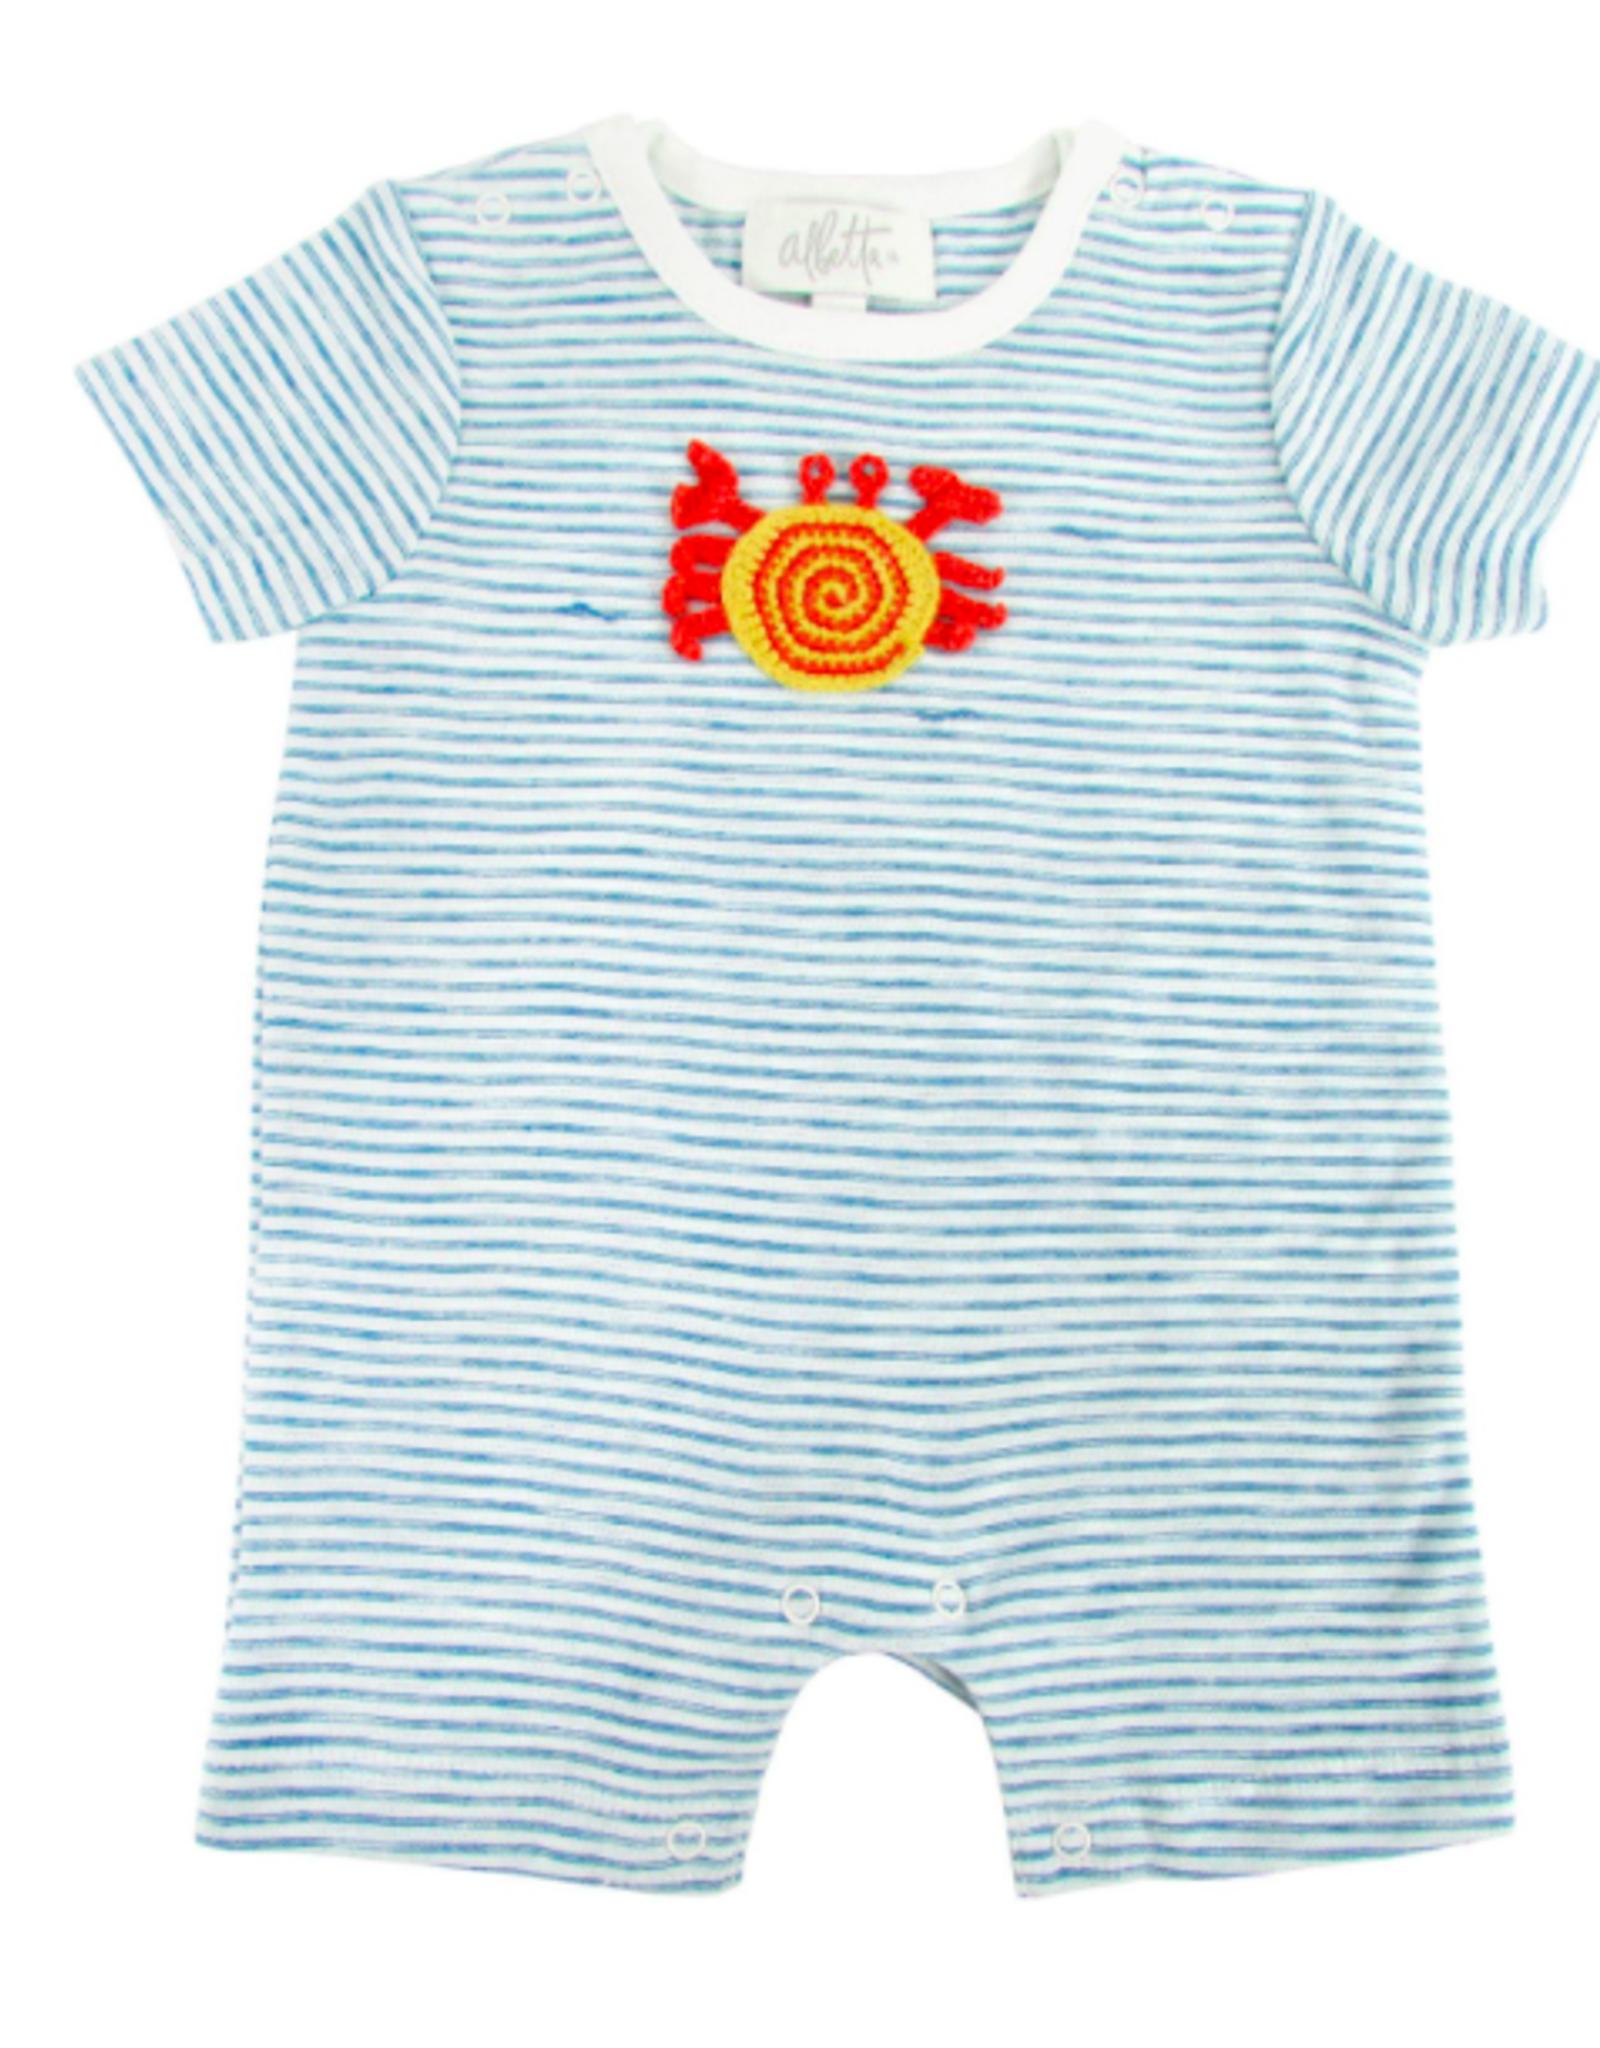 Albetta Crochet Babyvest